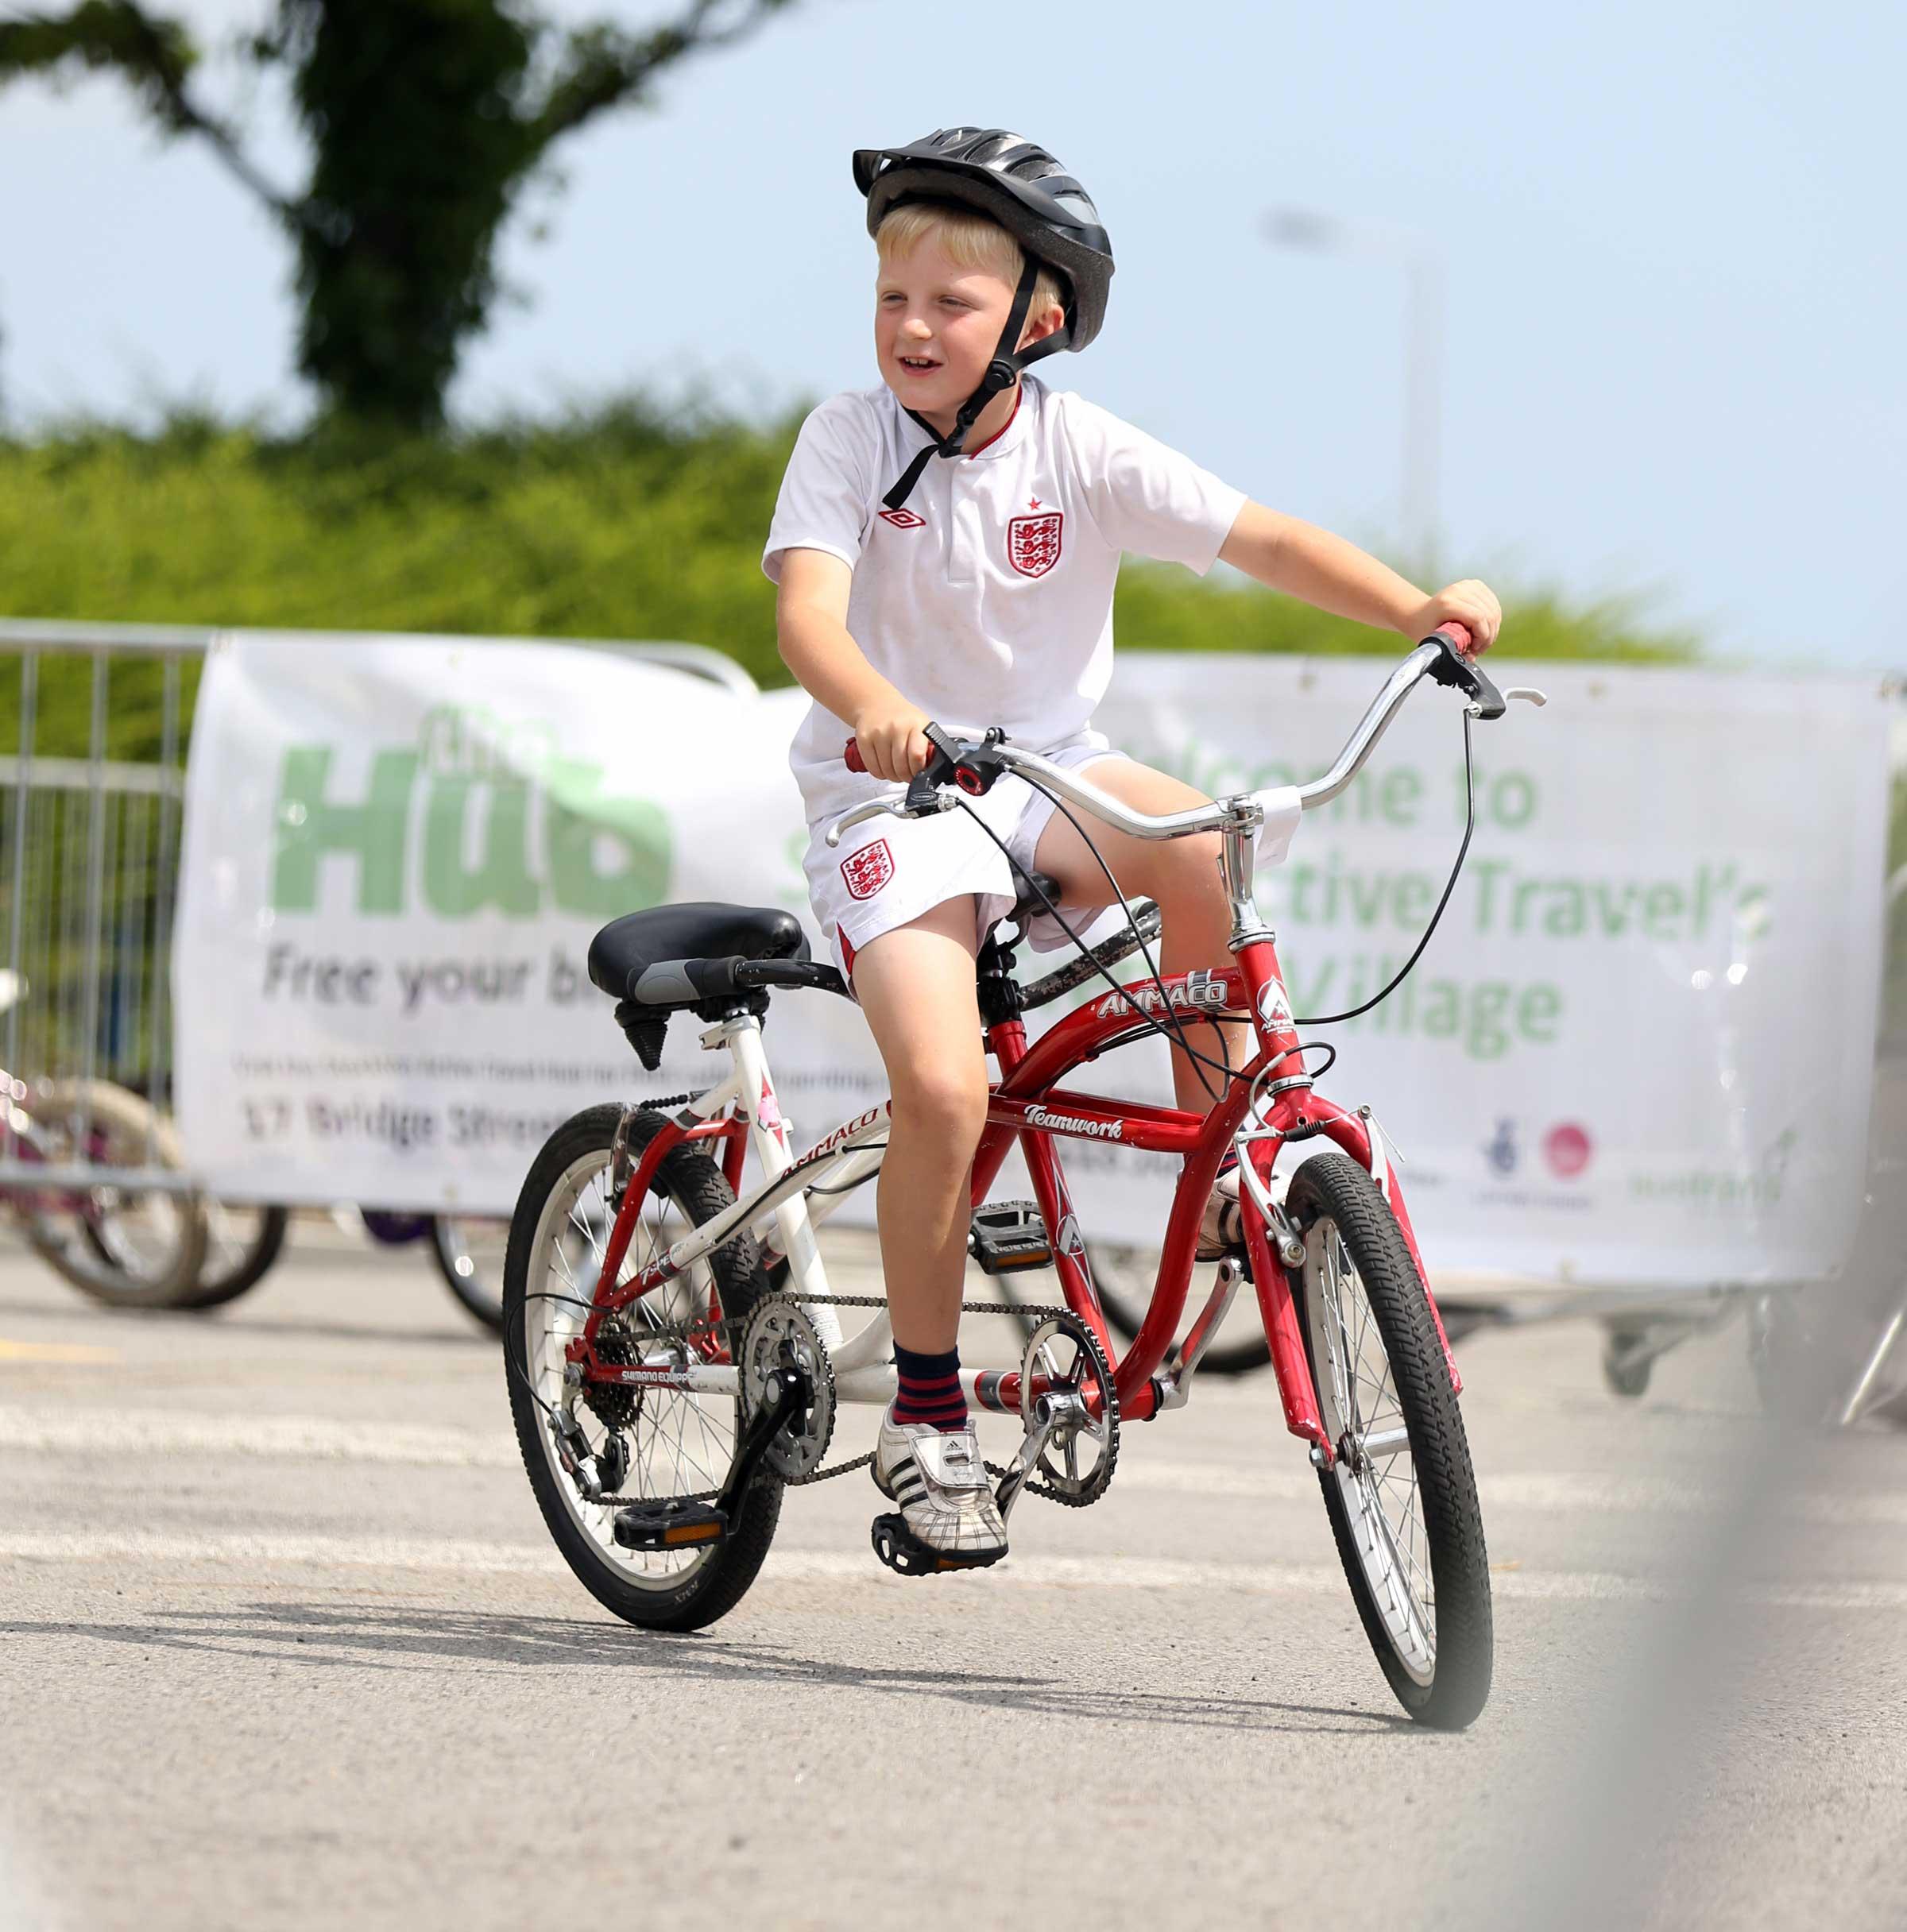 Stockport Urban Enduro Kids Cycling